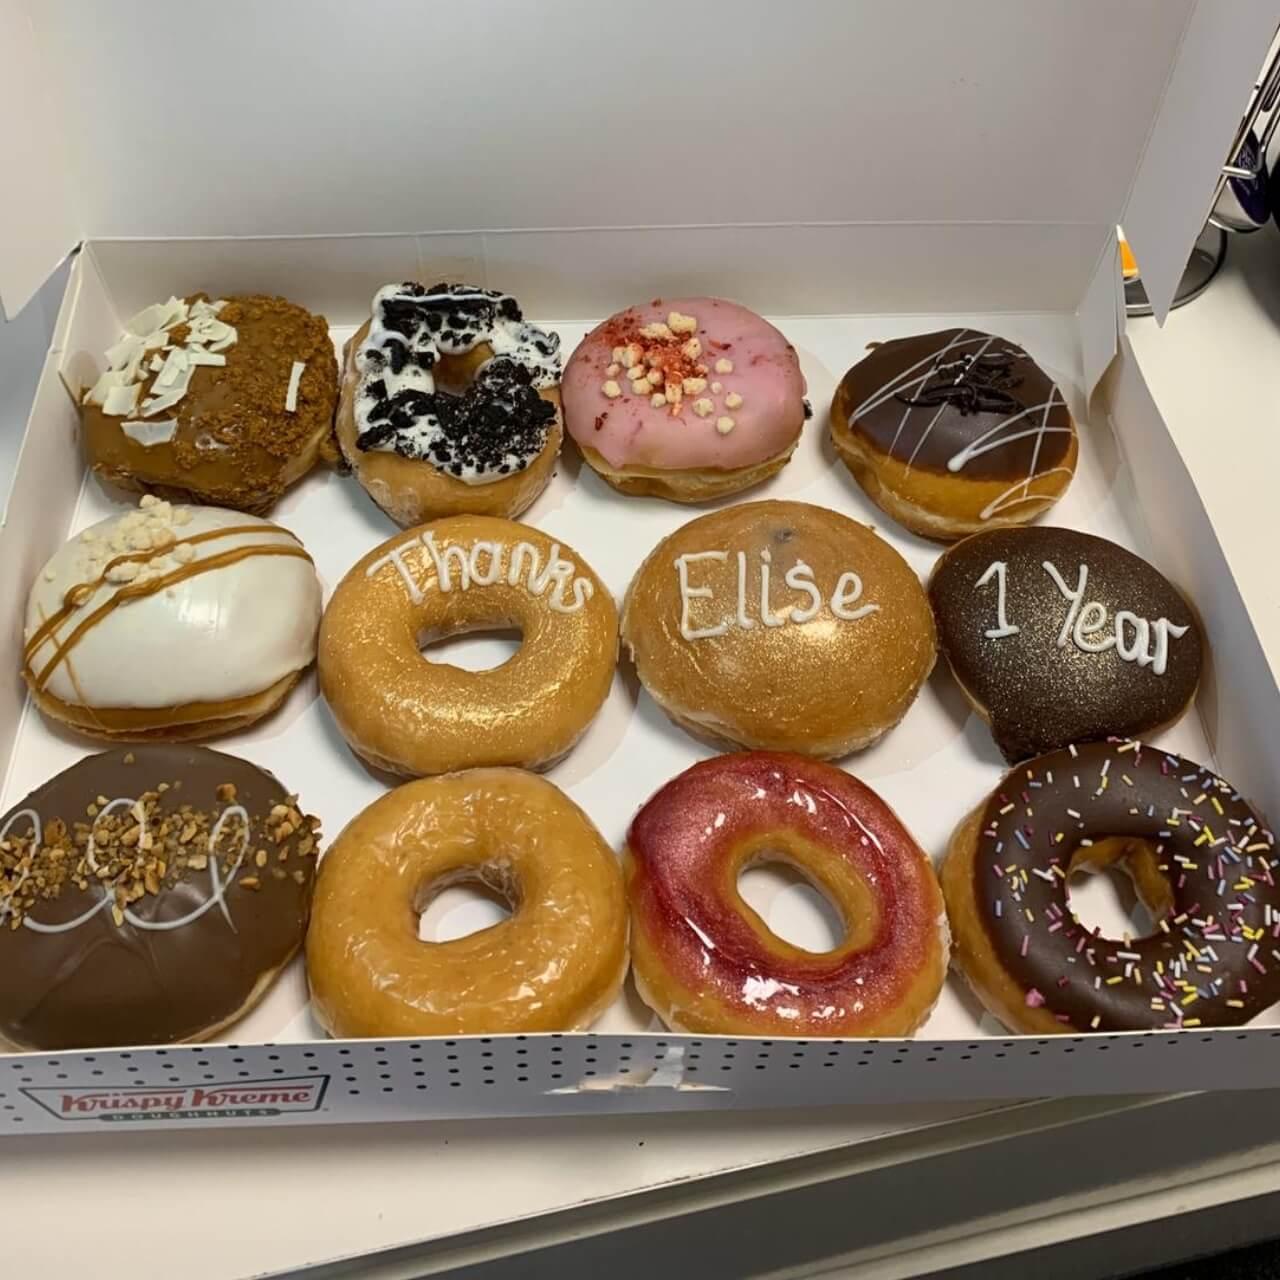 Elise's Anniversary Doughnuts